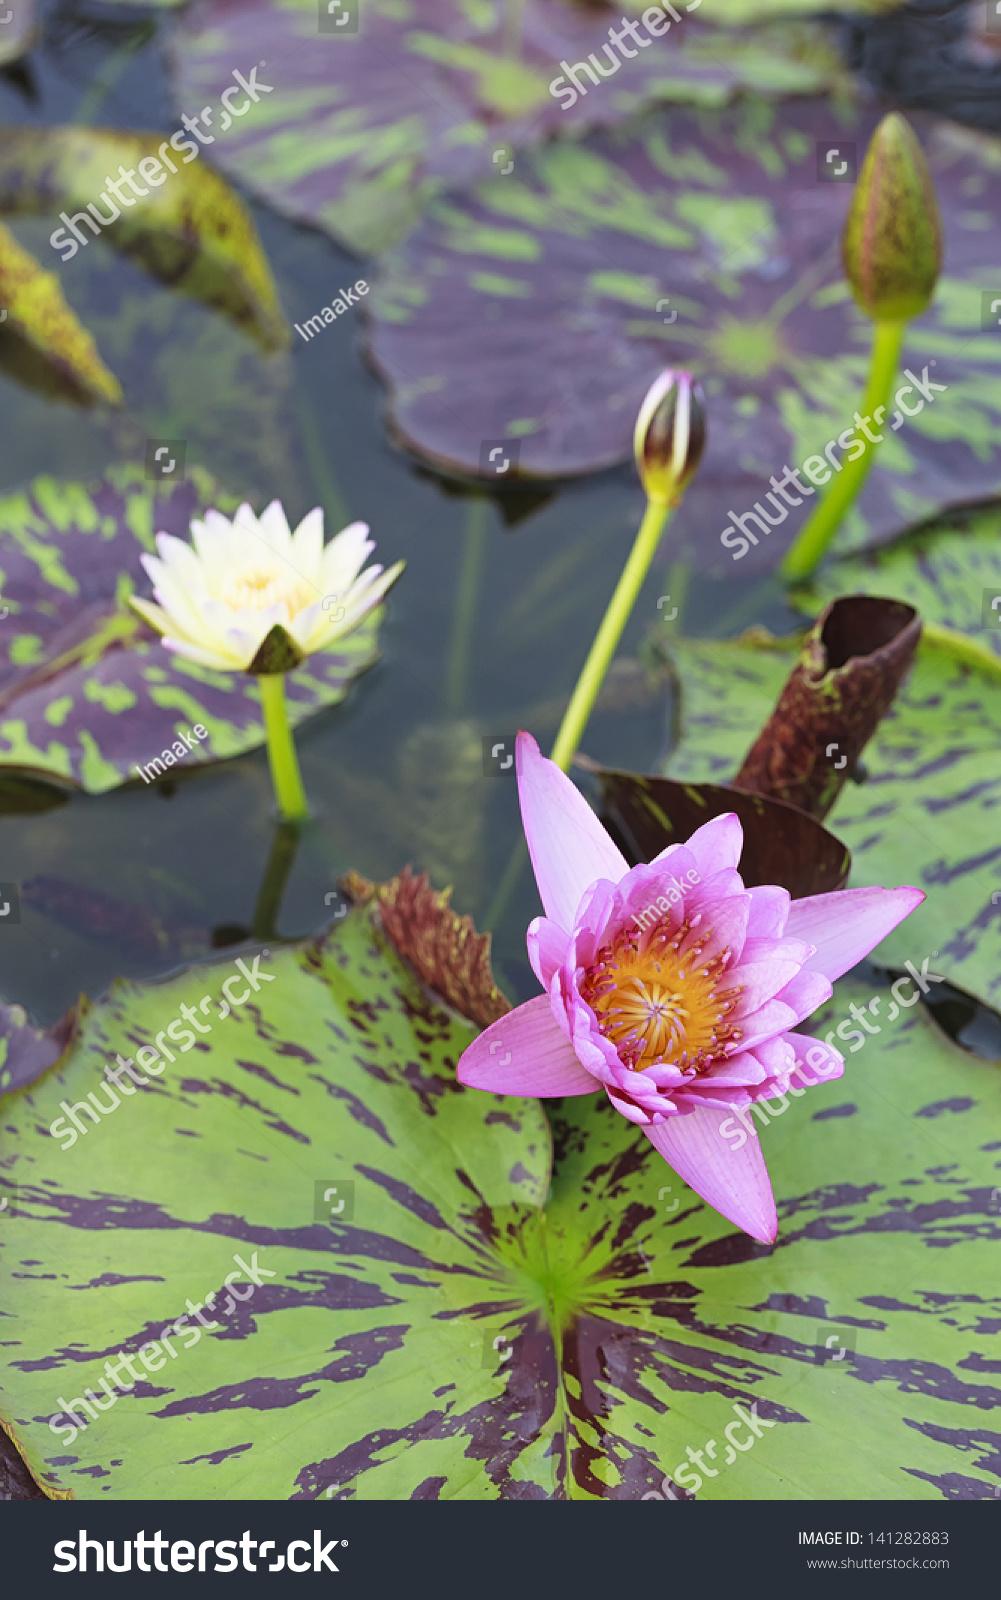 Blossom Lotus Flower Japanese Pond Focus Stock Photo Edit Now